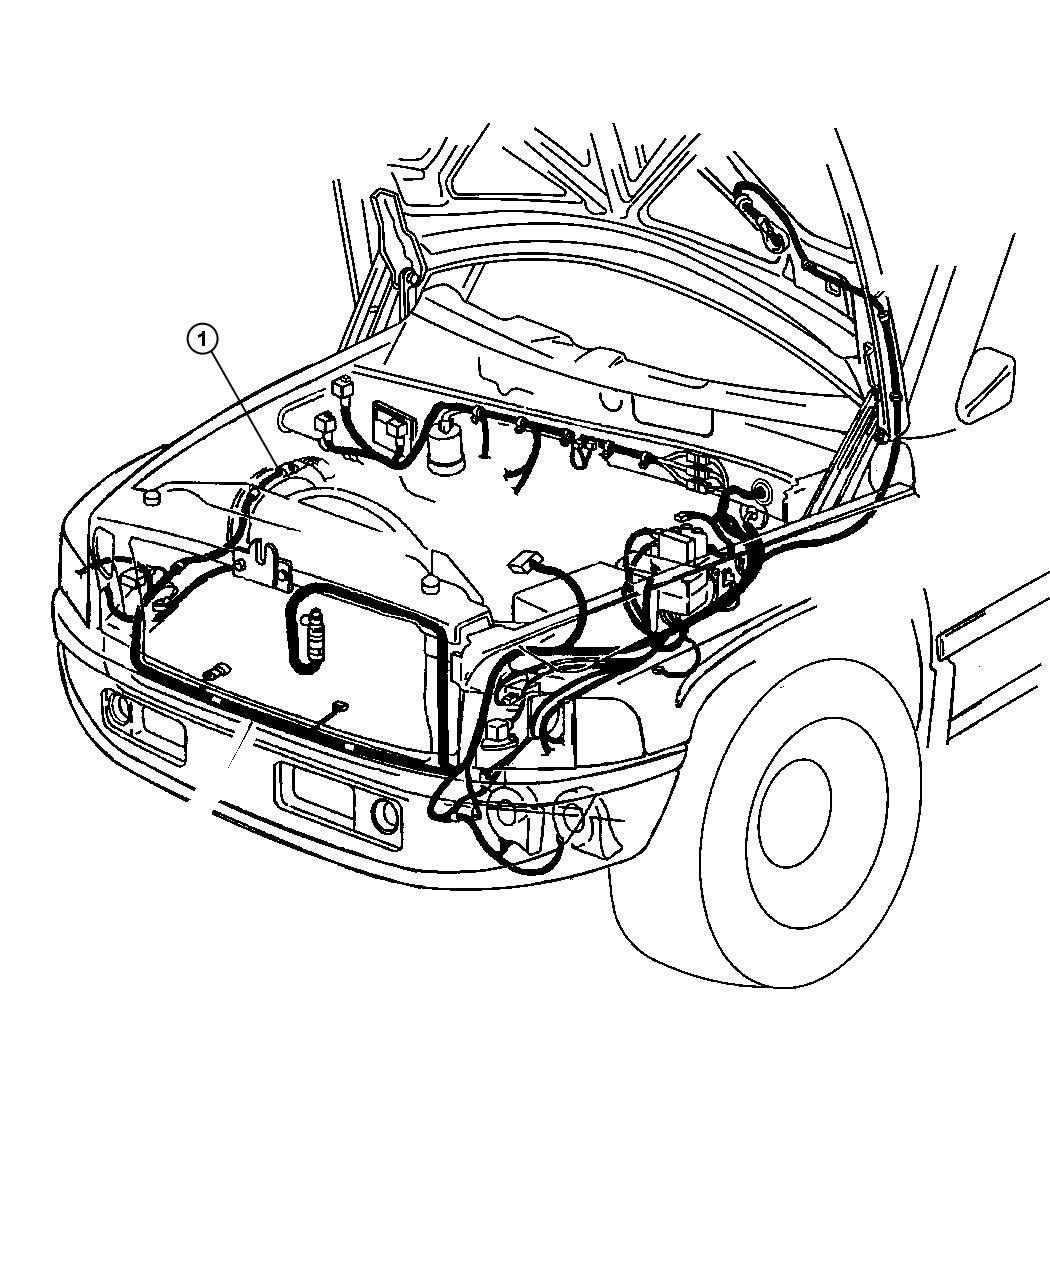 Dodge Ram Wiring Headlamp To Dash Brt Lock